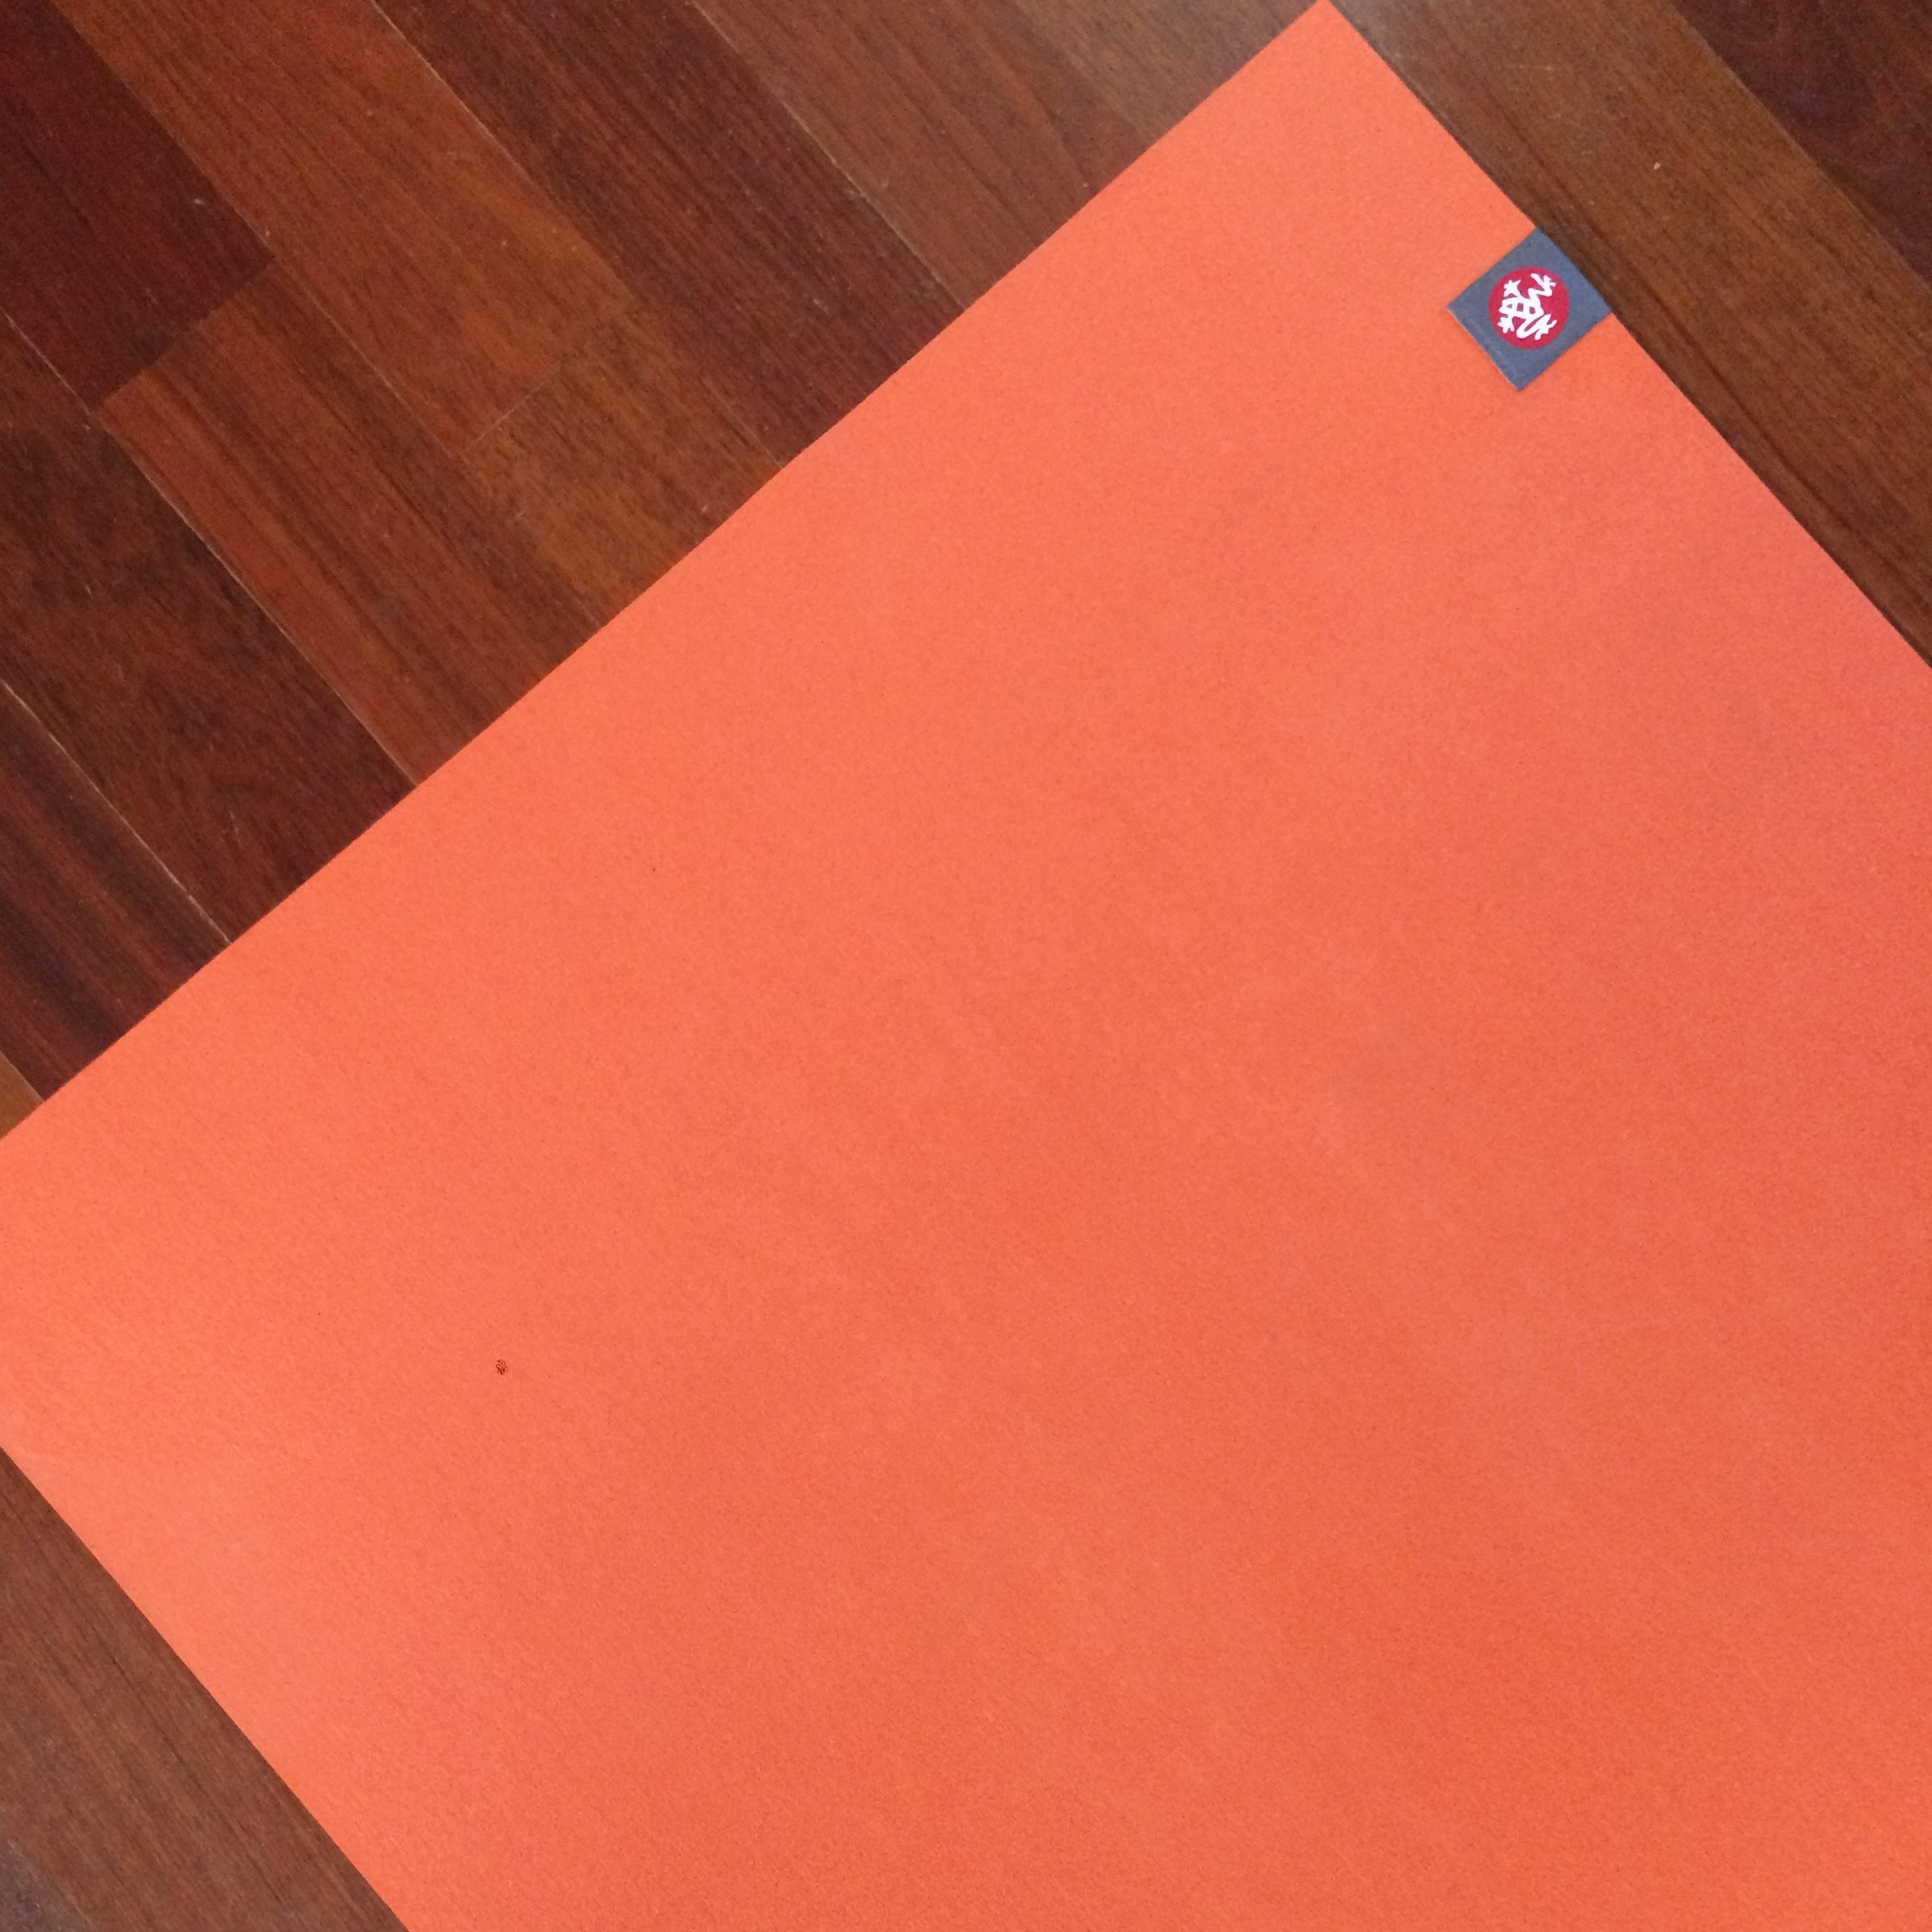 barefoot your to practice buildings mat balanced transform mats yoga harmony city jade adult